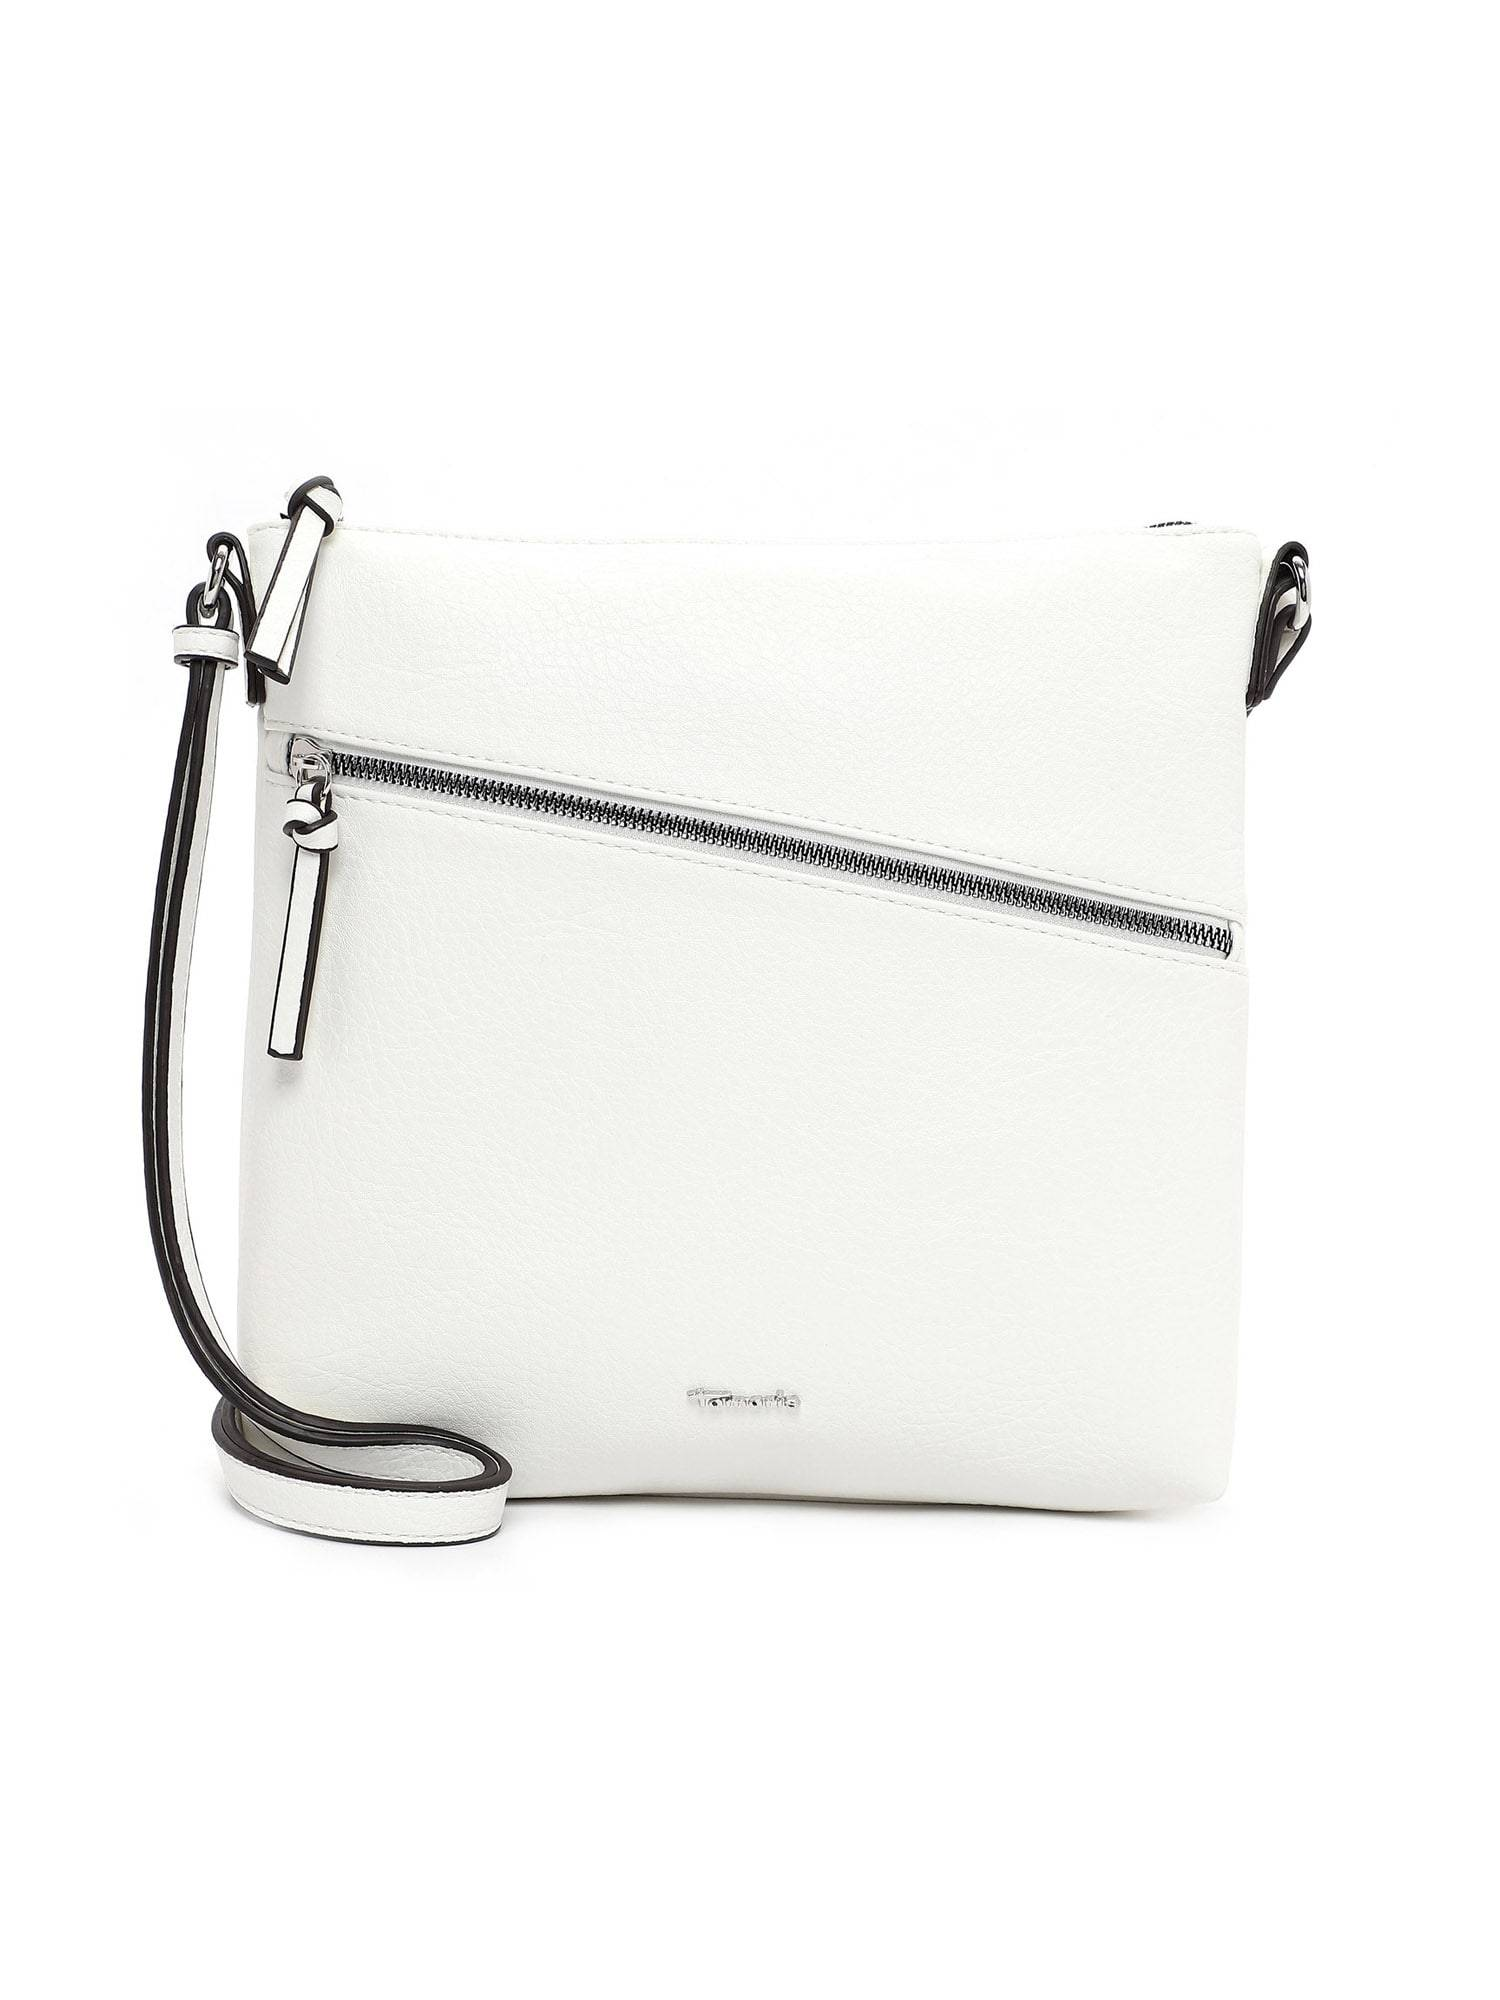 TAMARIS Sac bandoulière 'Alessia'  - Blanc - Taille: One Size - female